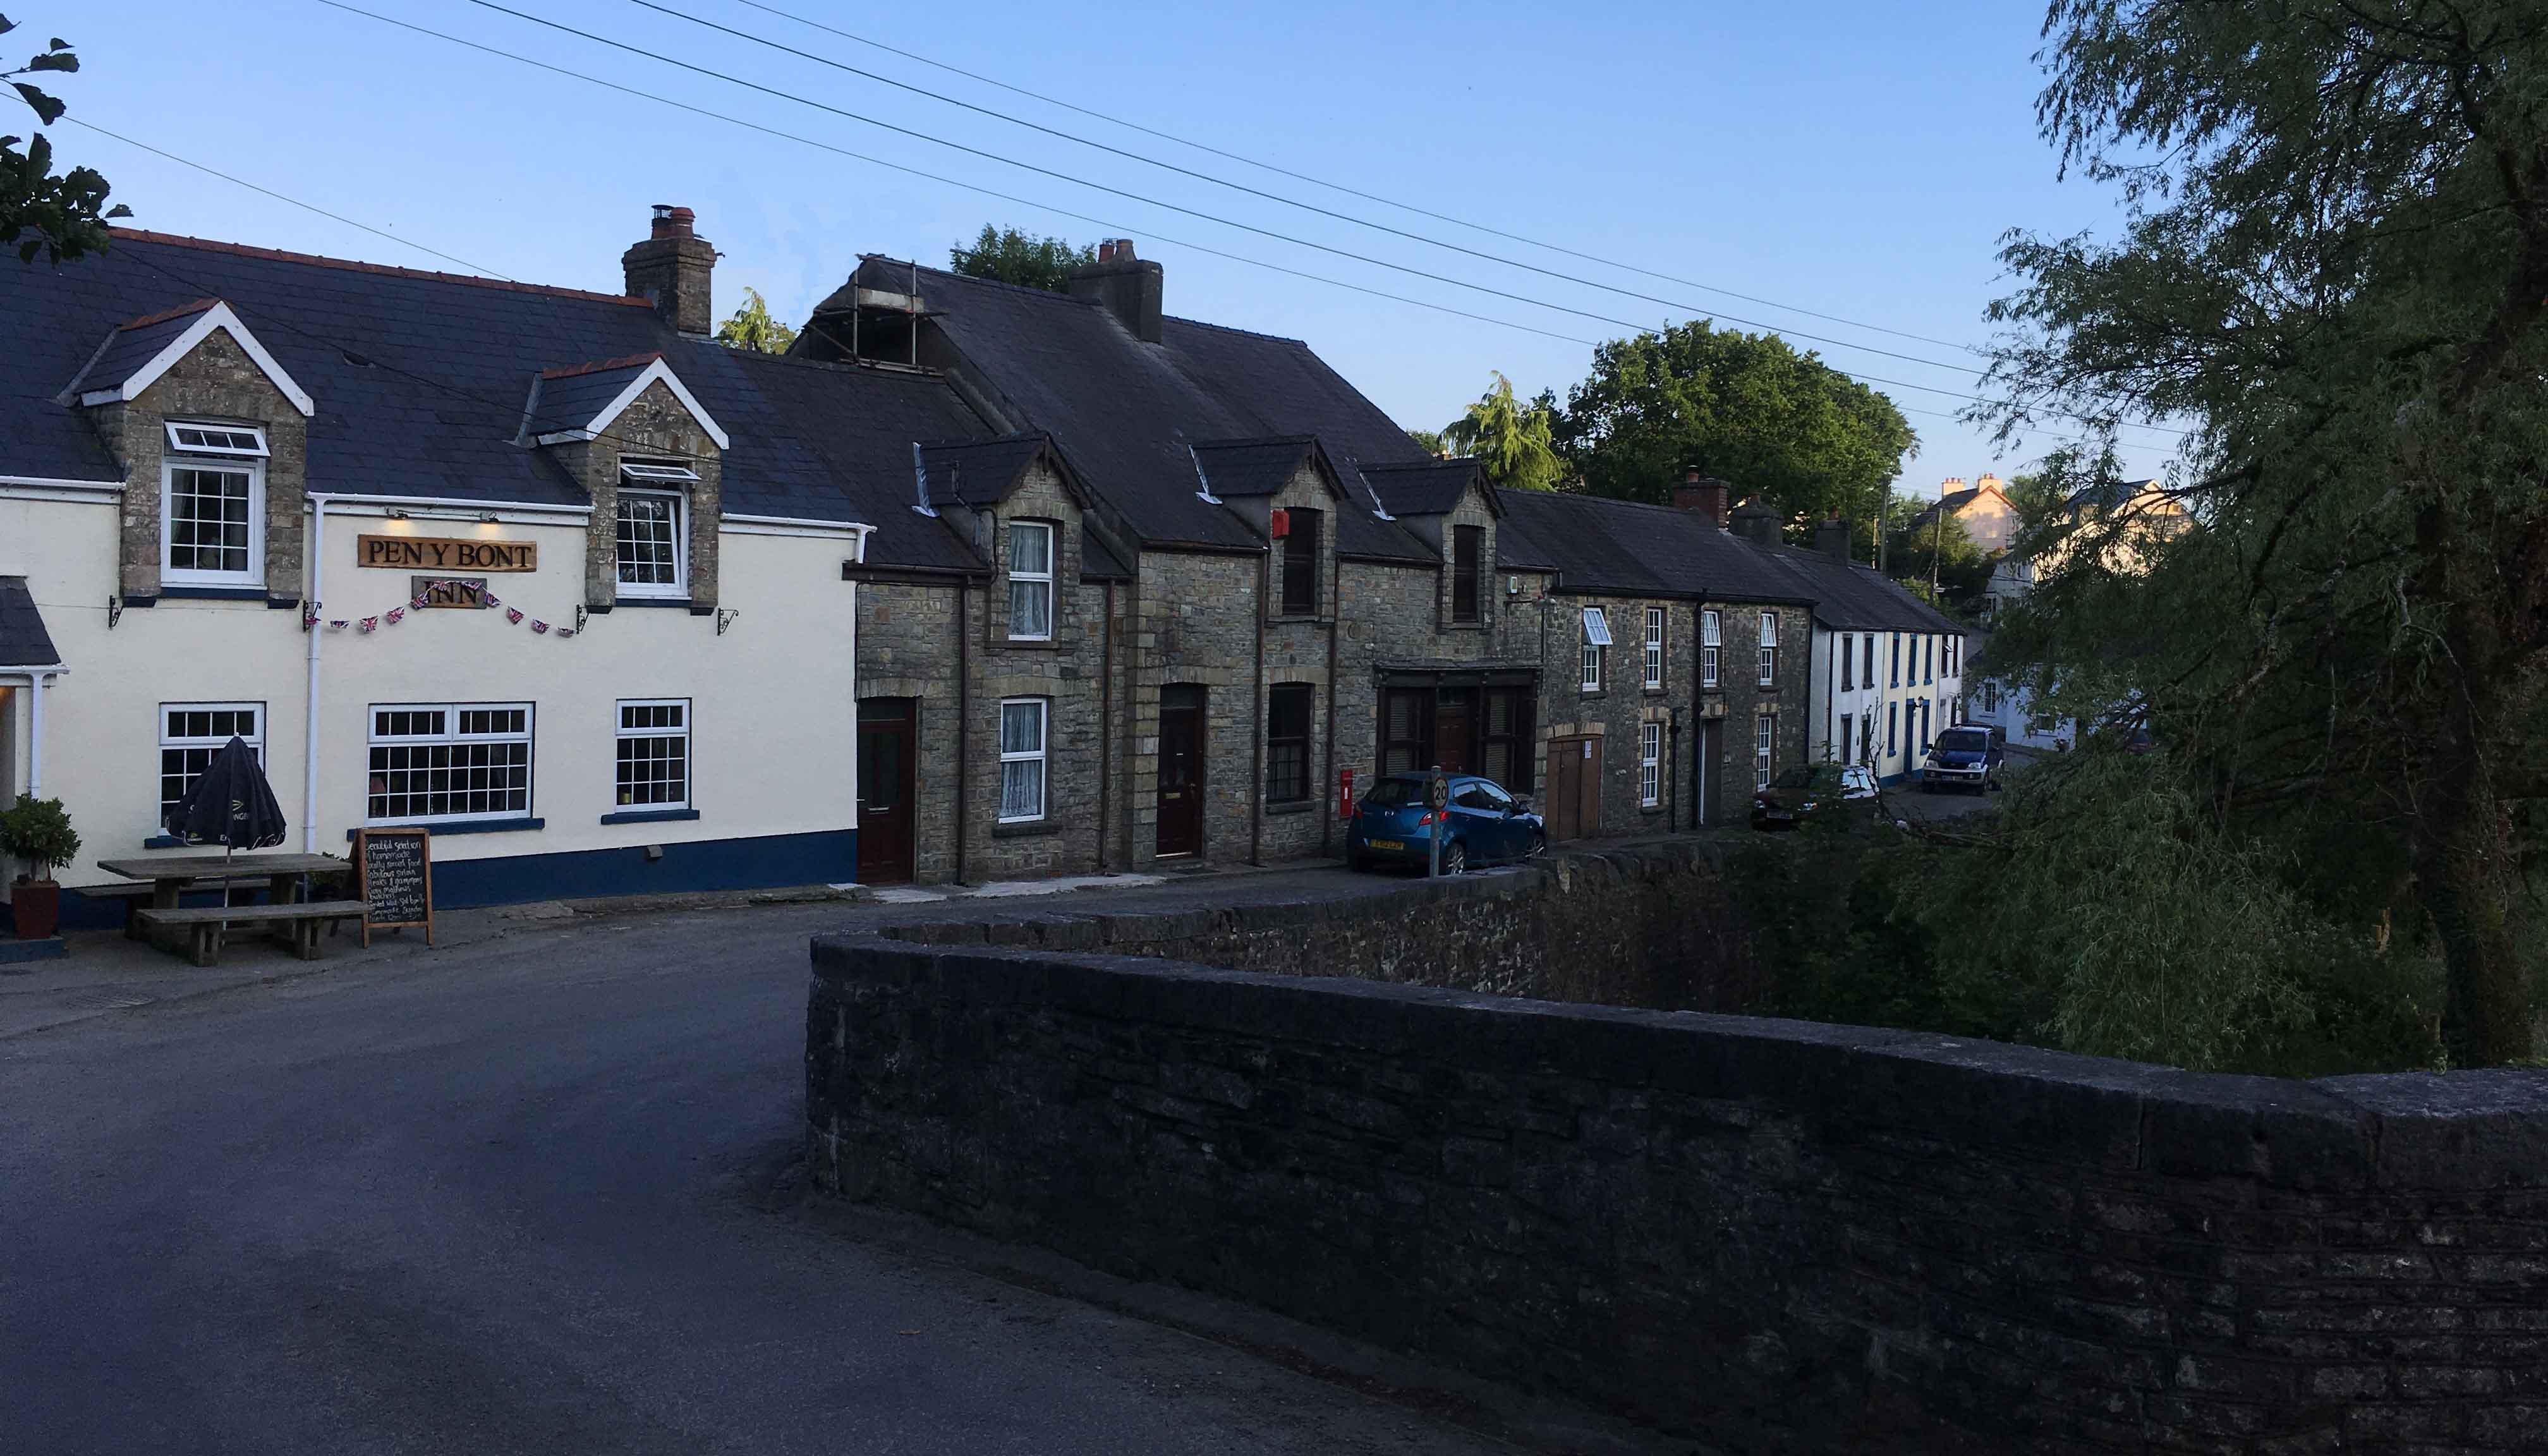 Llanfynydd-village-centre-Carmarthenshire